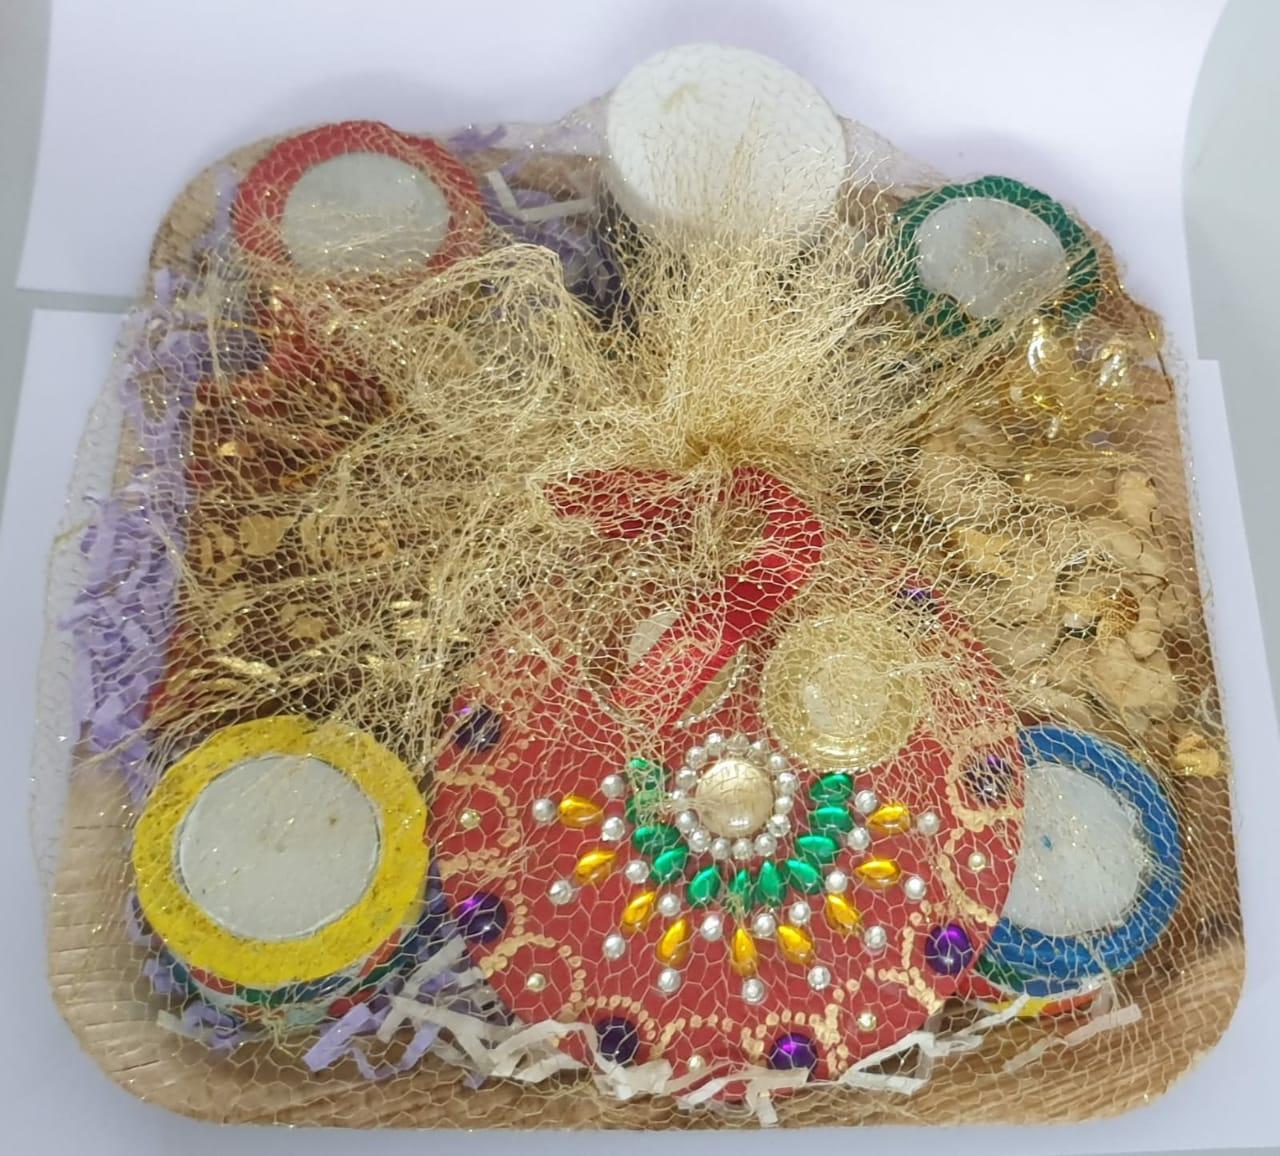 Diwali Hamper (Kumkum Chokha Plate, 4 Diyas, Roasted Almond, Roasted Cashew, Raisins, Honey) Slider Thumbnail 1/5